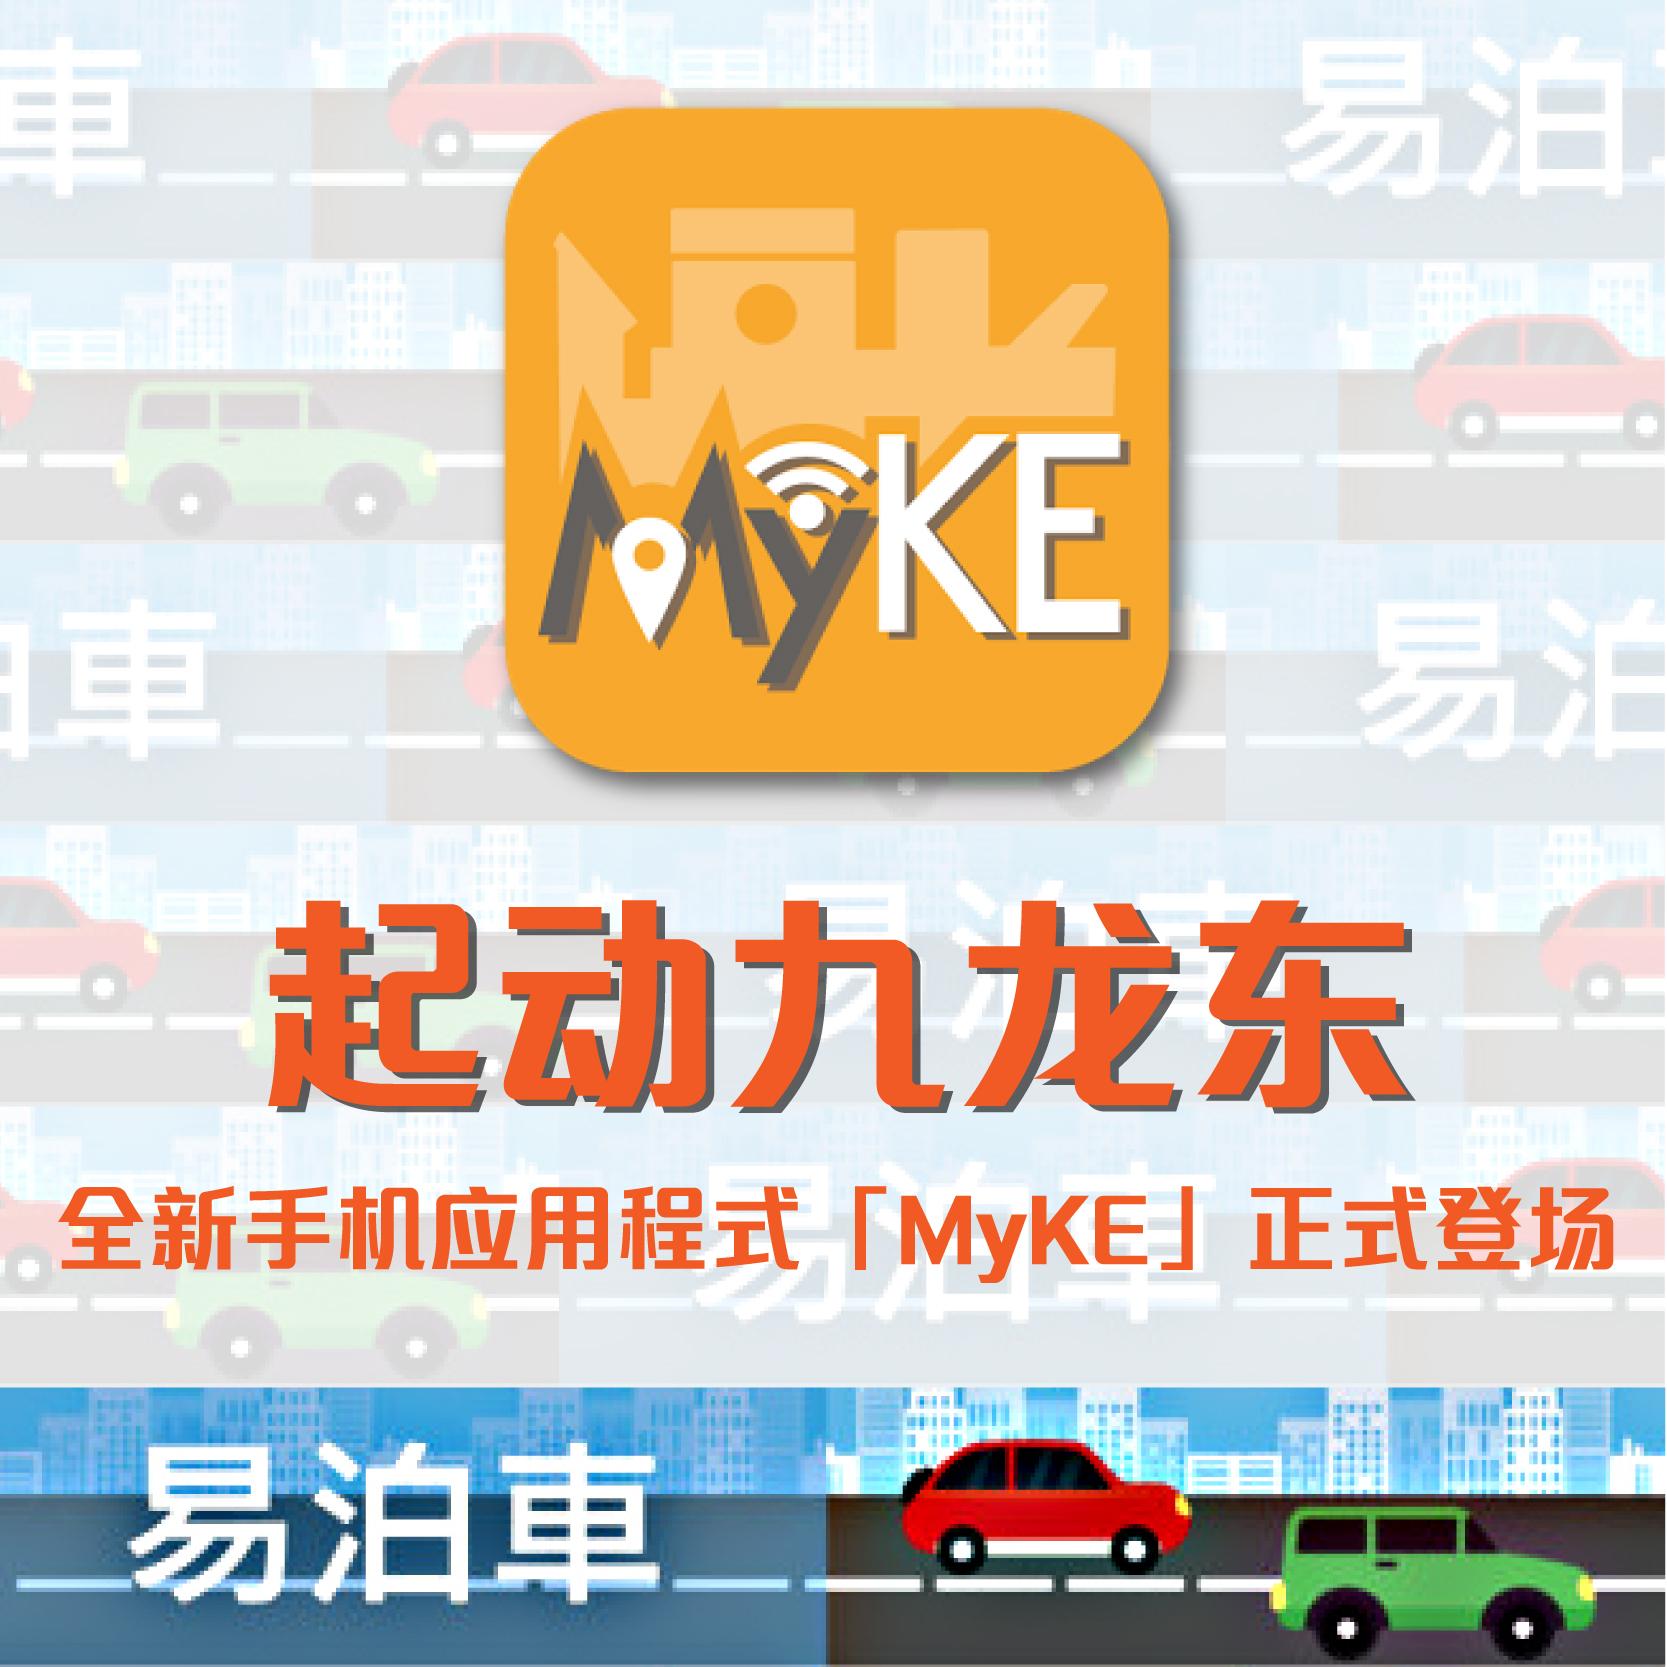 「MyKE」手机应用程式正式登场